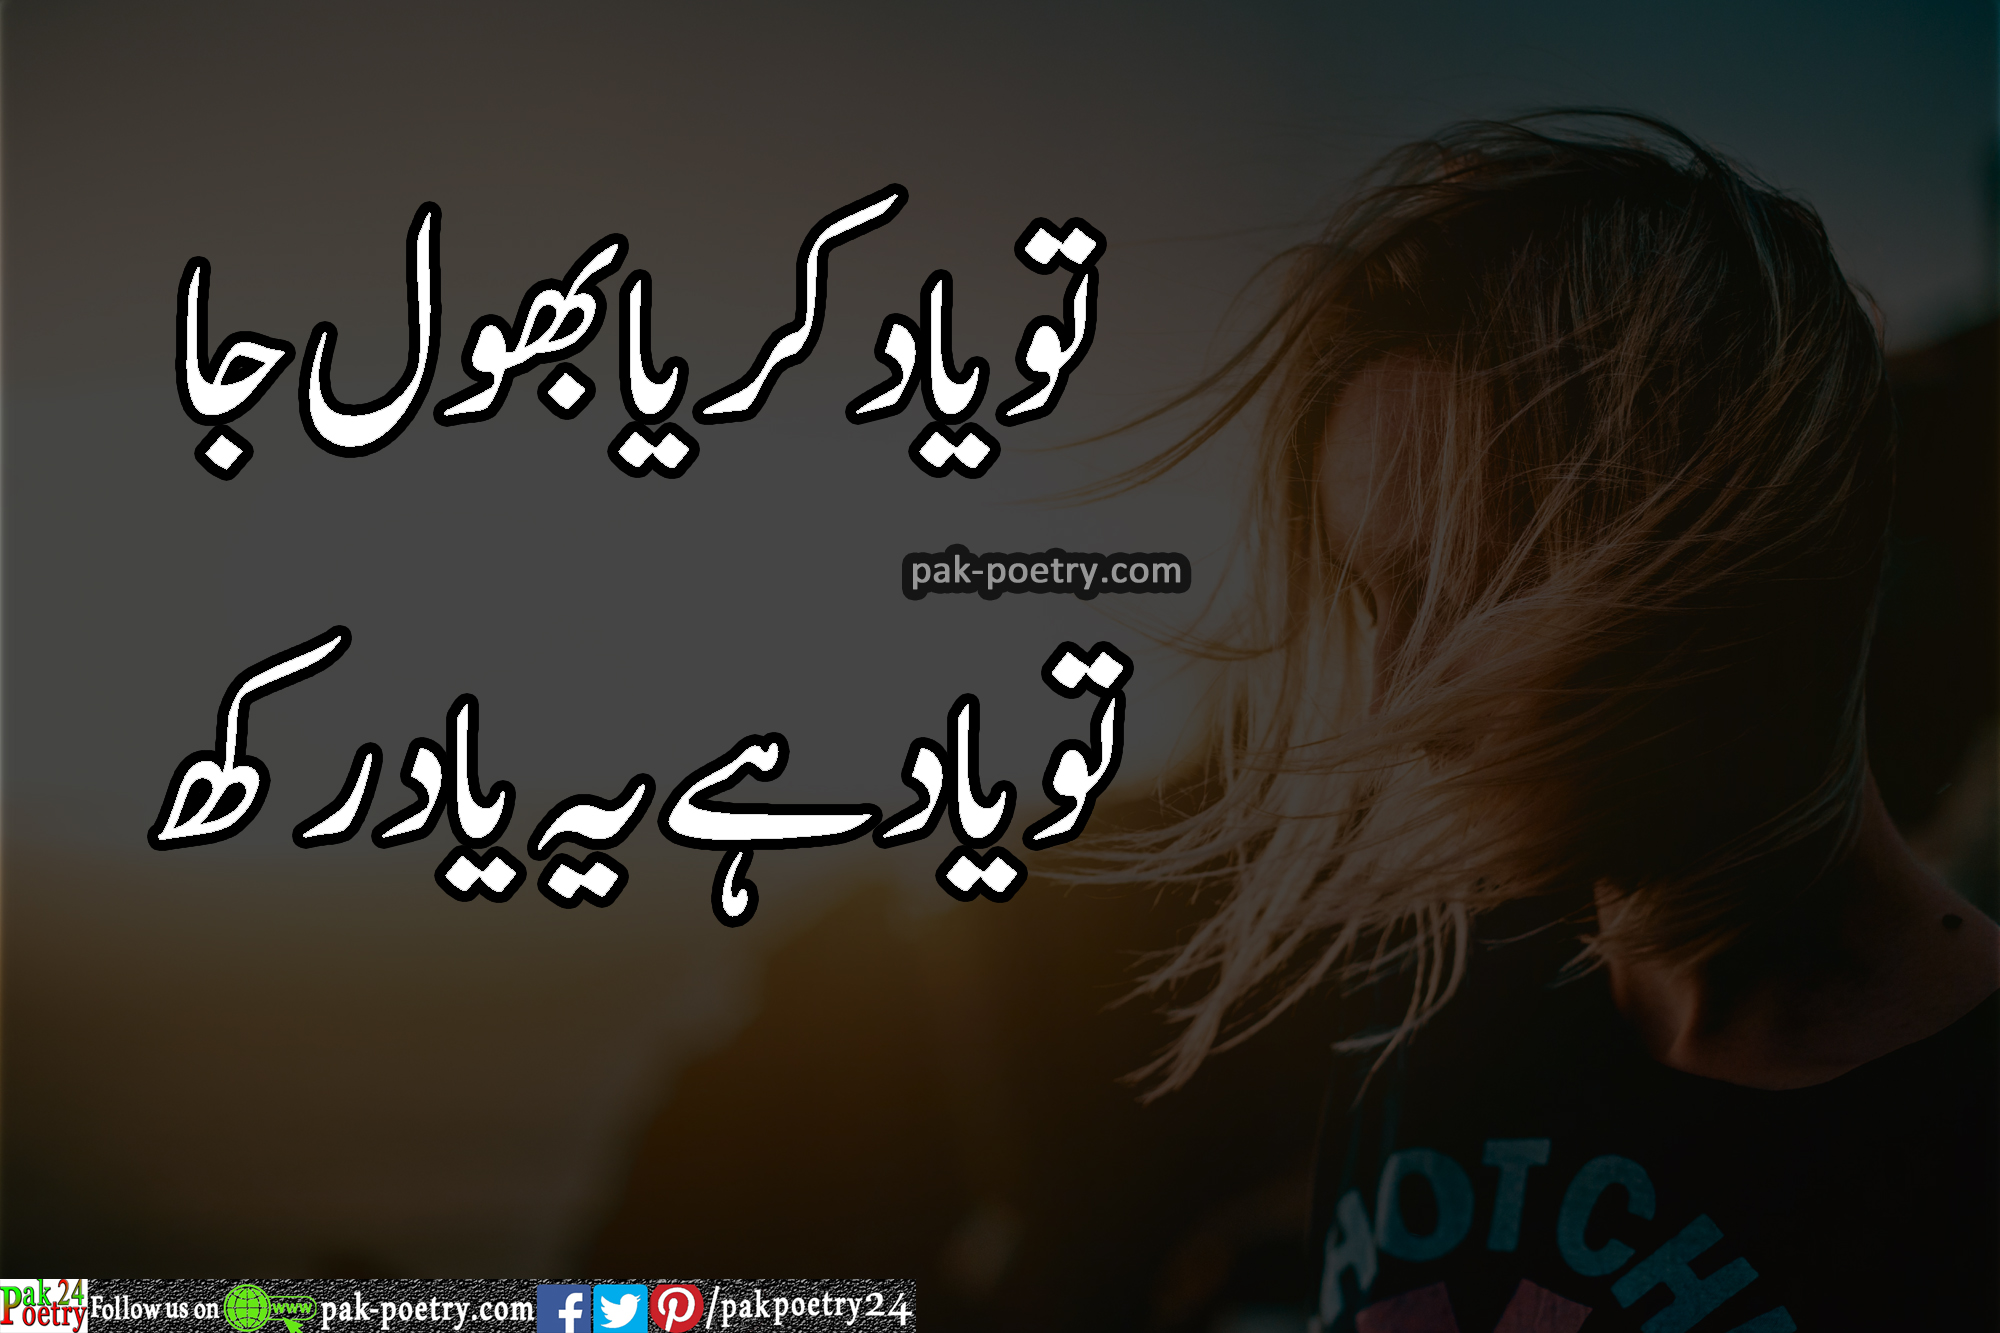 sad poetry -  tu yad kr ya bhool ja -  tu yad hy ye yad rkhe